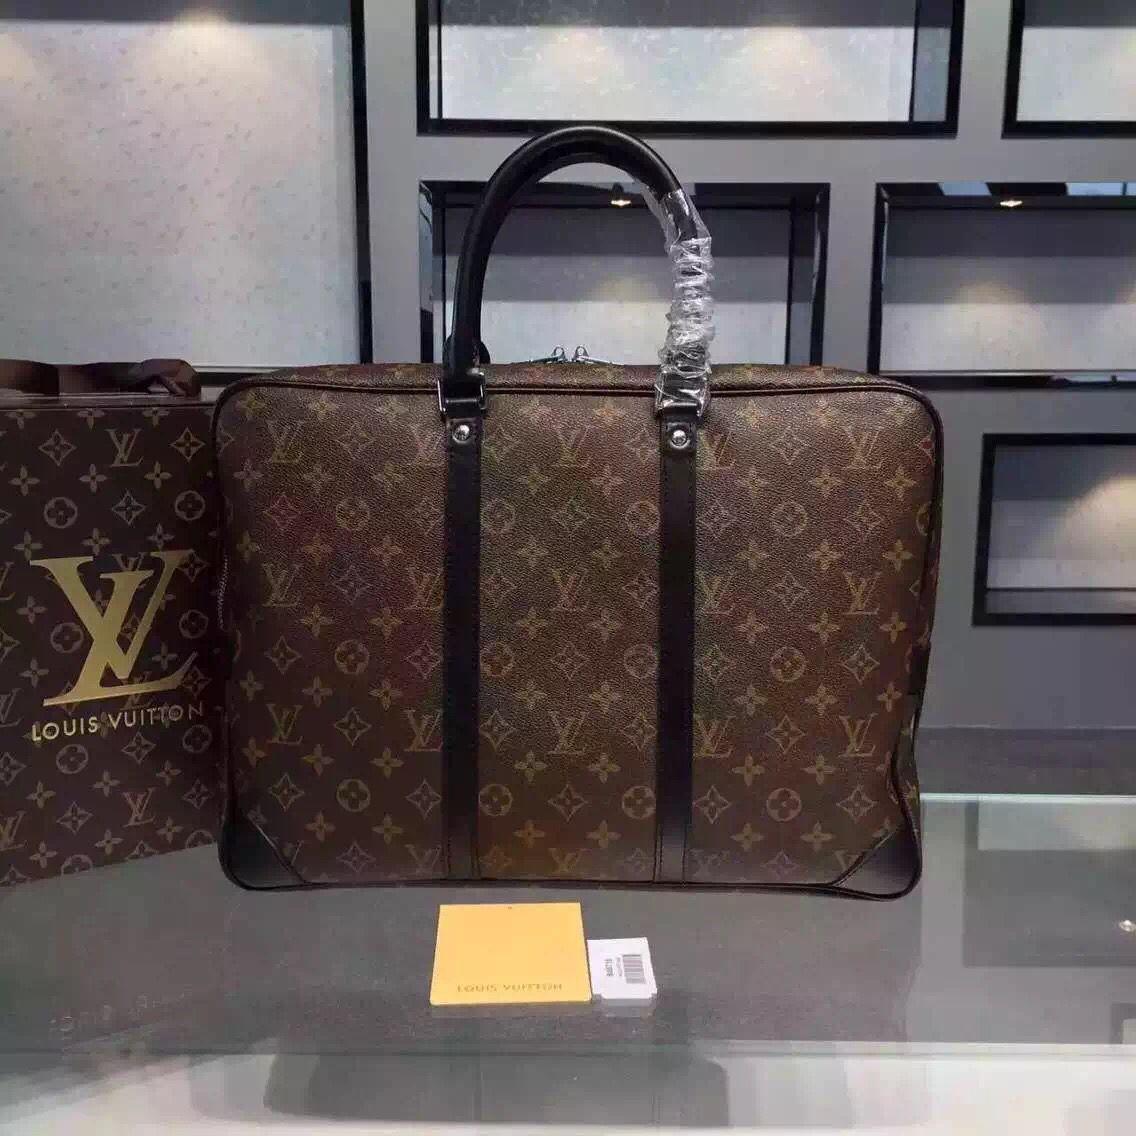 e0332830ba5f #luxury#shopping#chanel#louisvuitton#dior#parda#gucci#hermes #Burberry#fendi#versace#bottegaveneta#givenchy#Cartier#VCA#Valentino#celine# ysl# ...